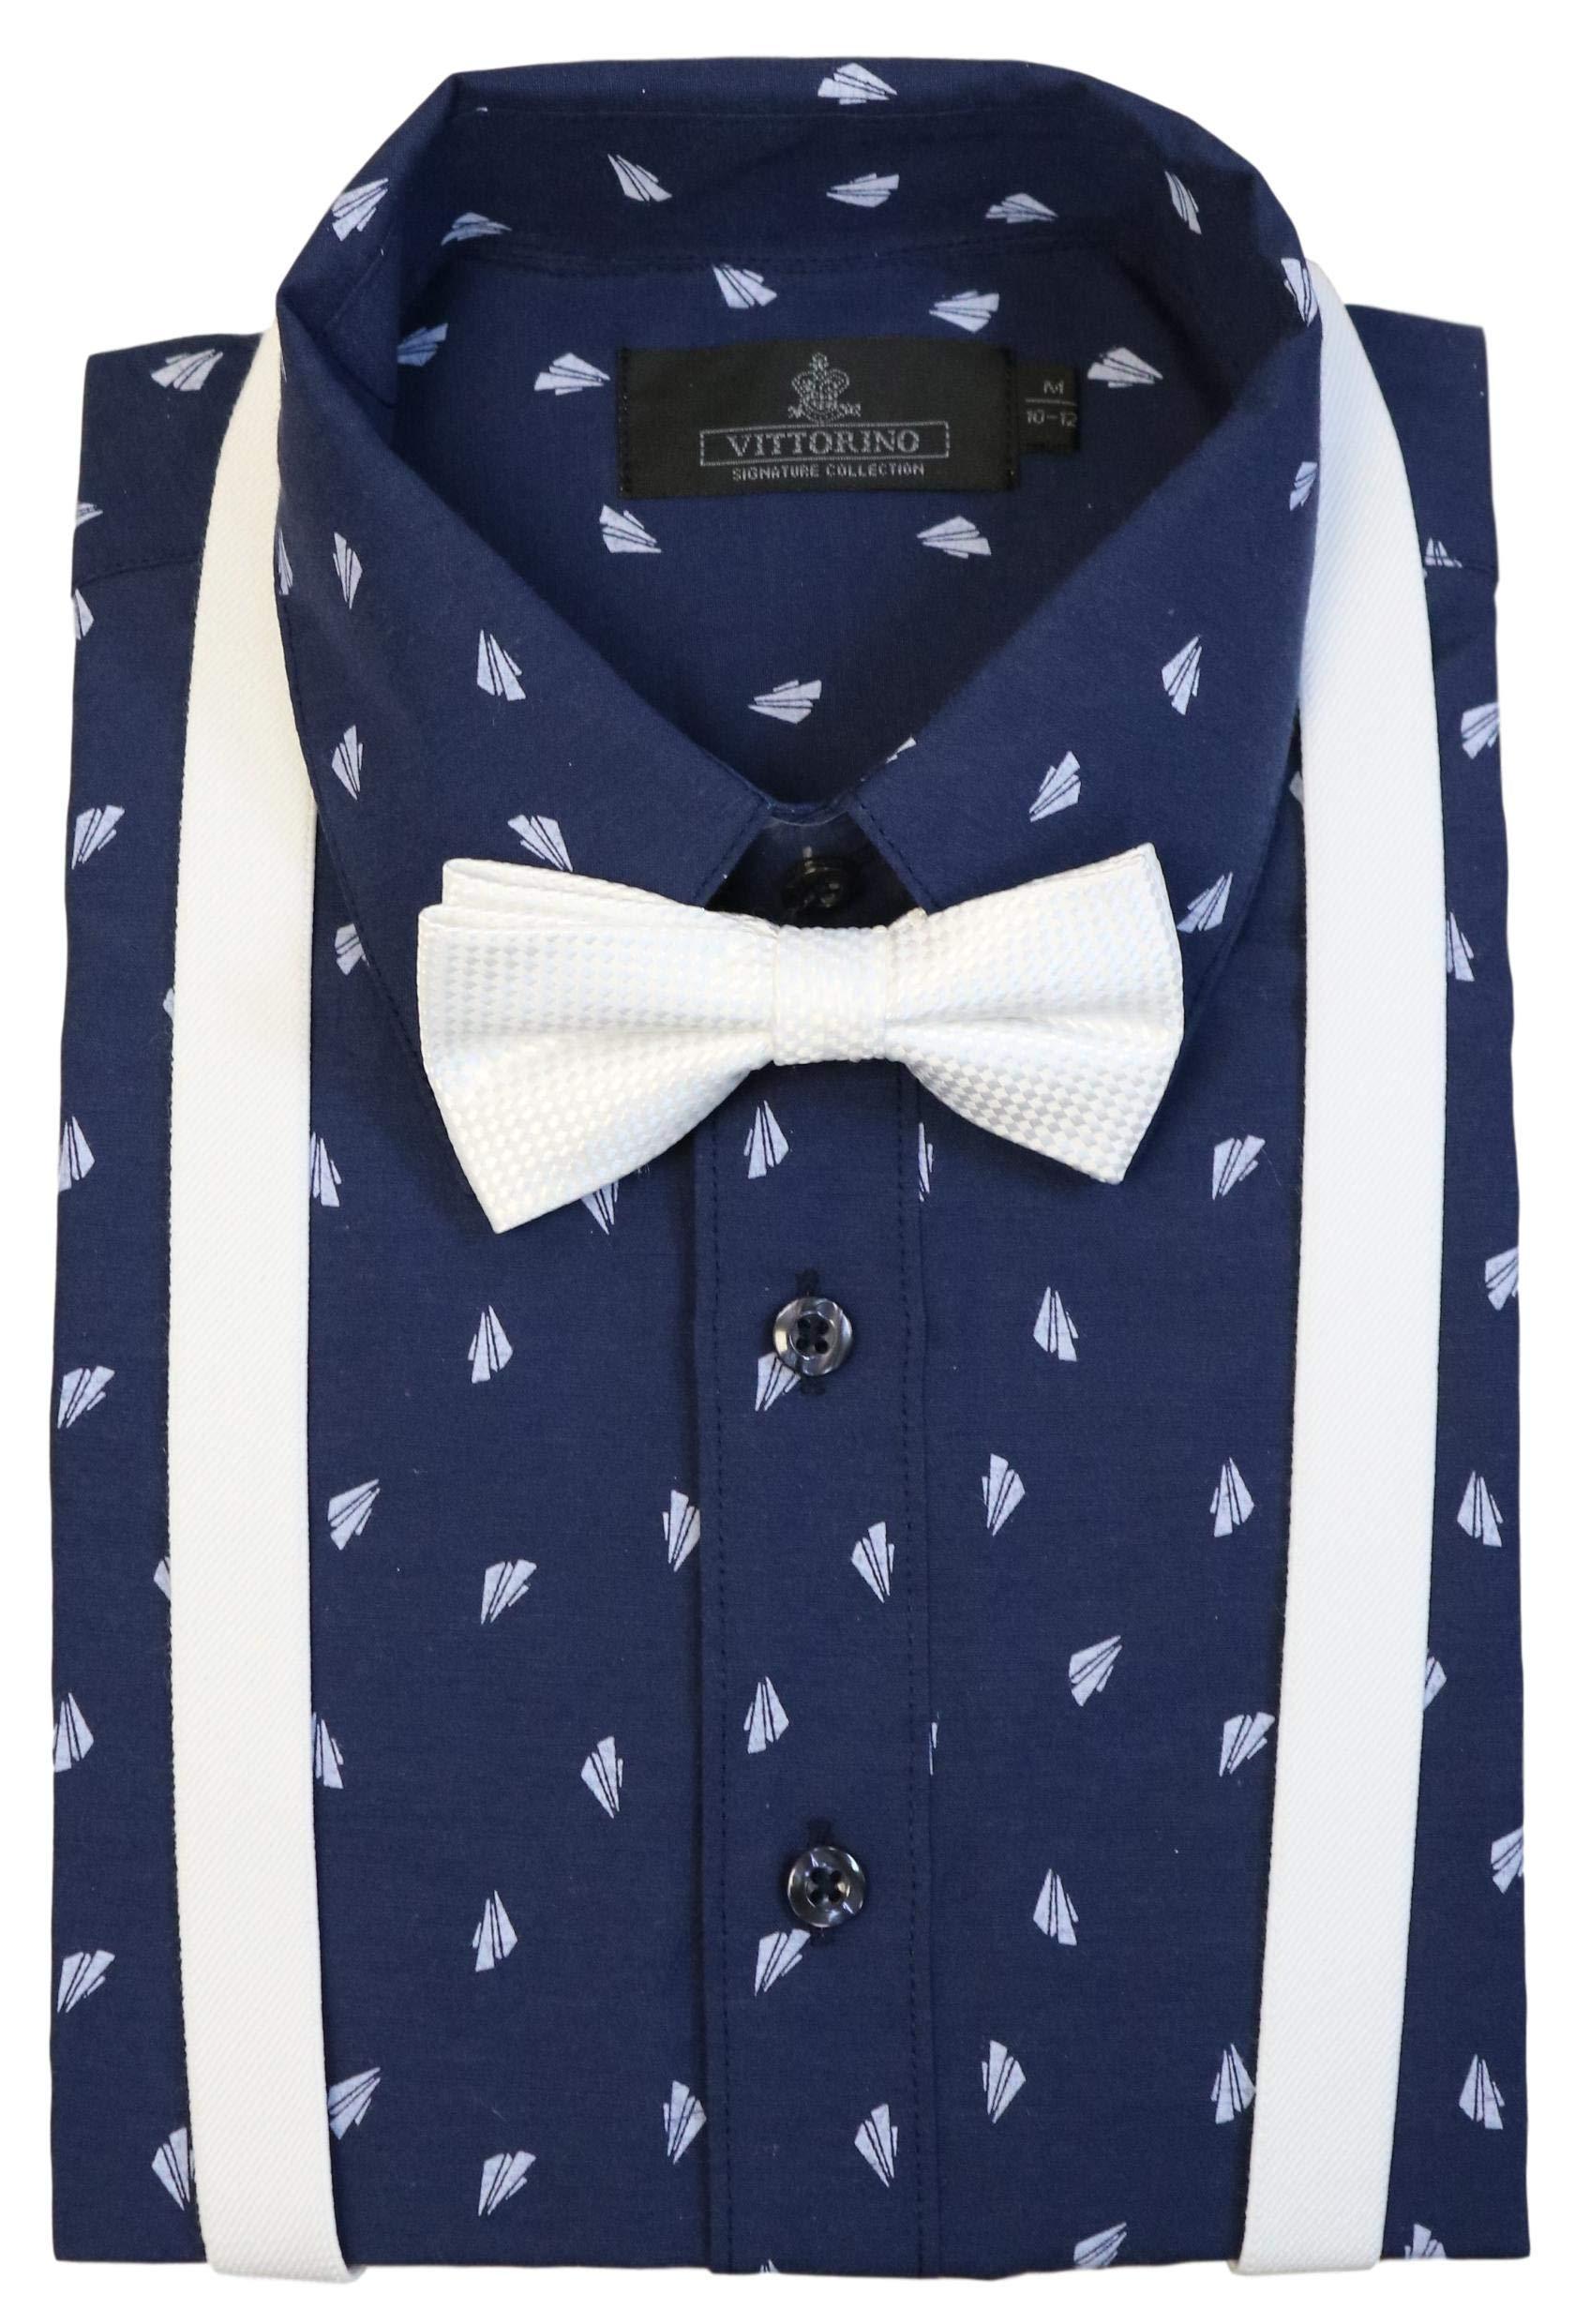 Vittorino Boys' Dress Shirt with Matching Bowtie and Suspenders Set, Navy White, 14/16